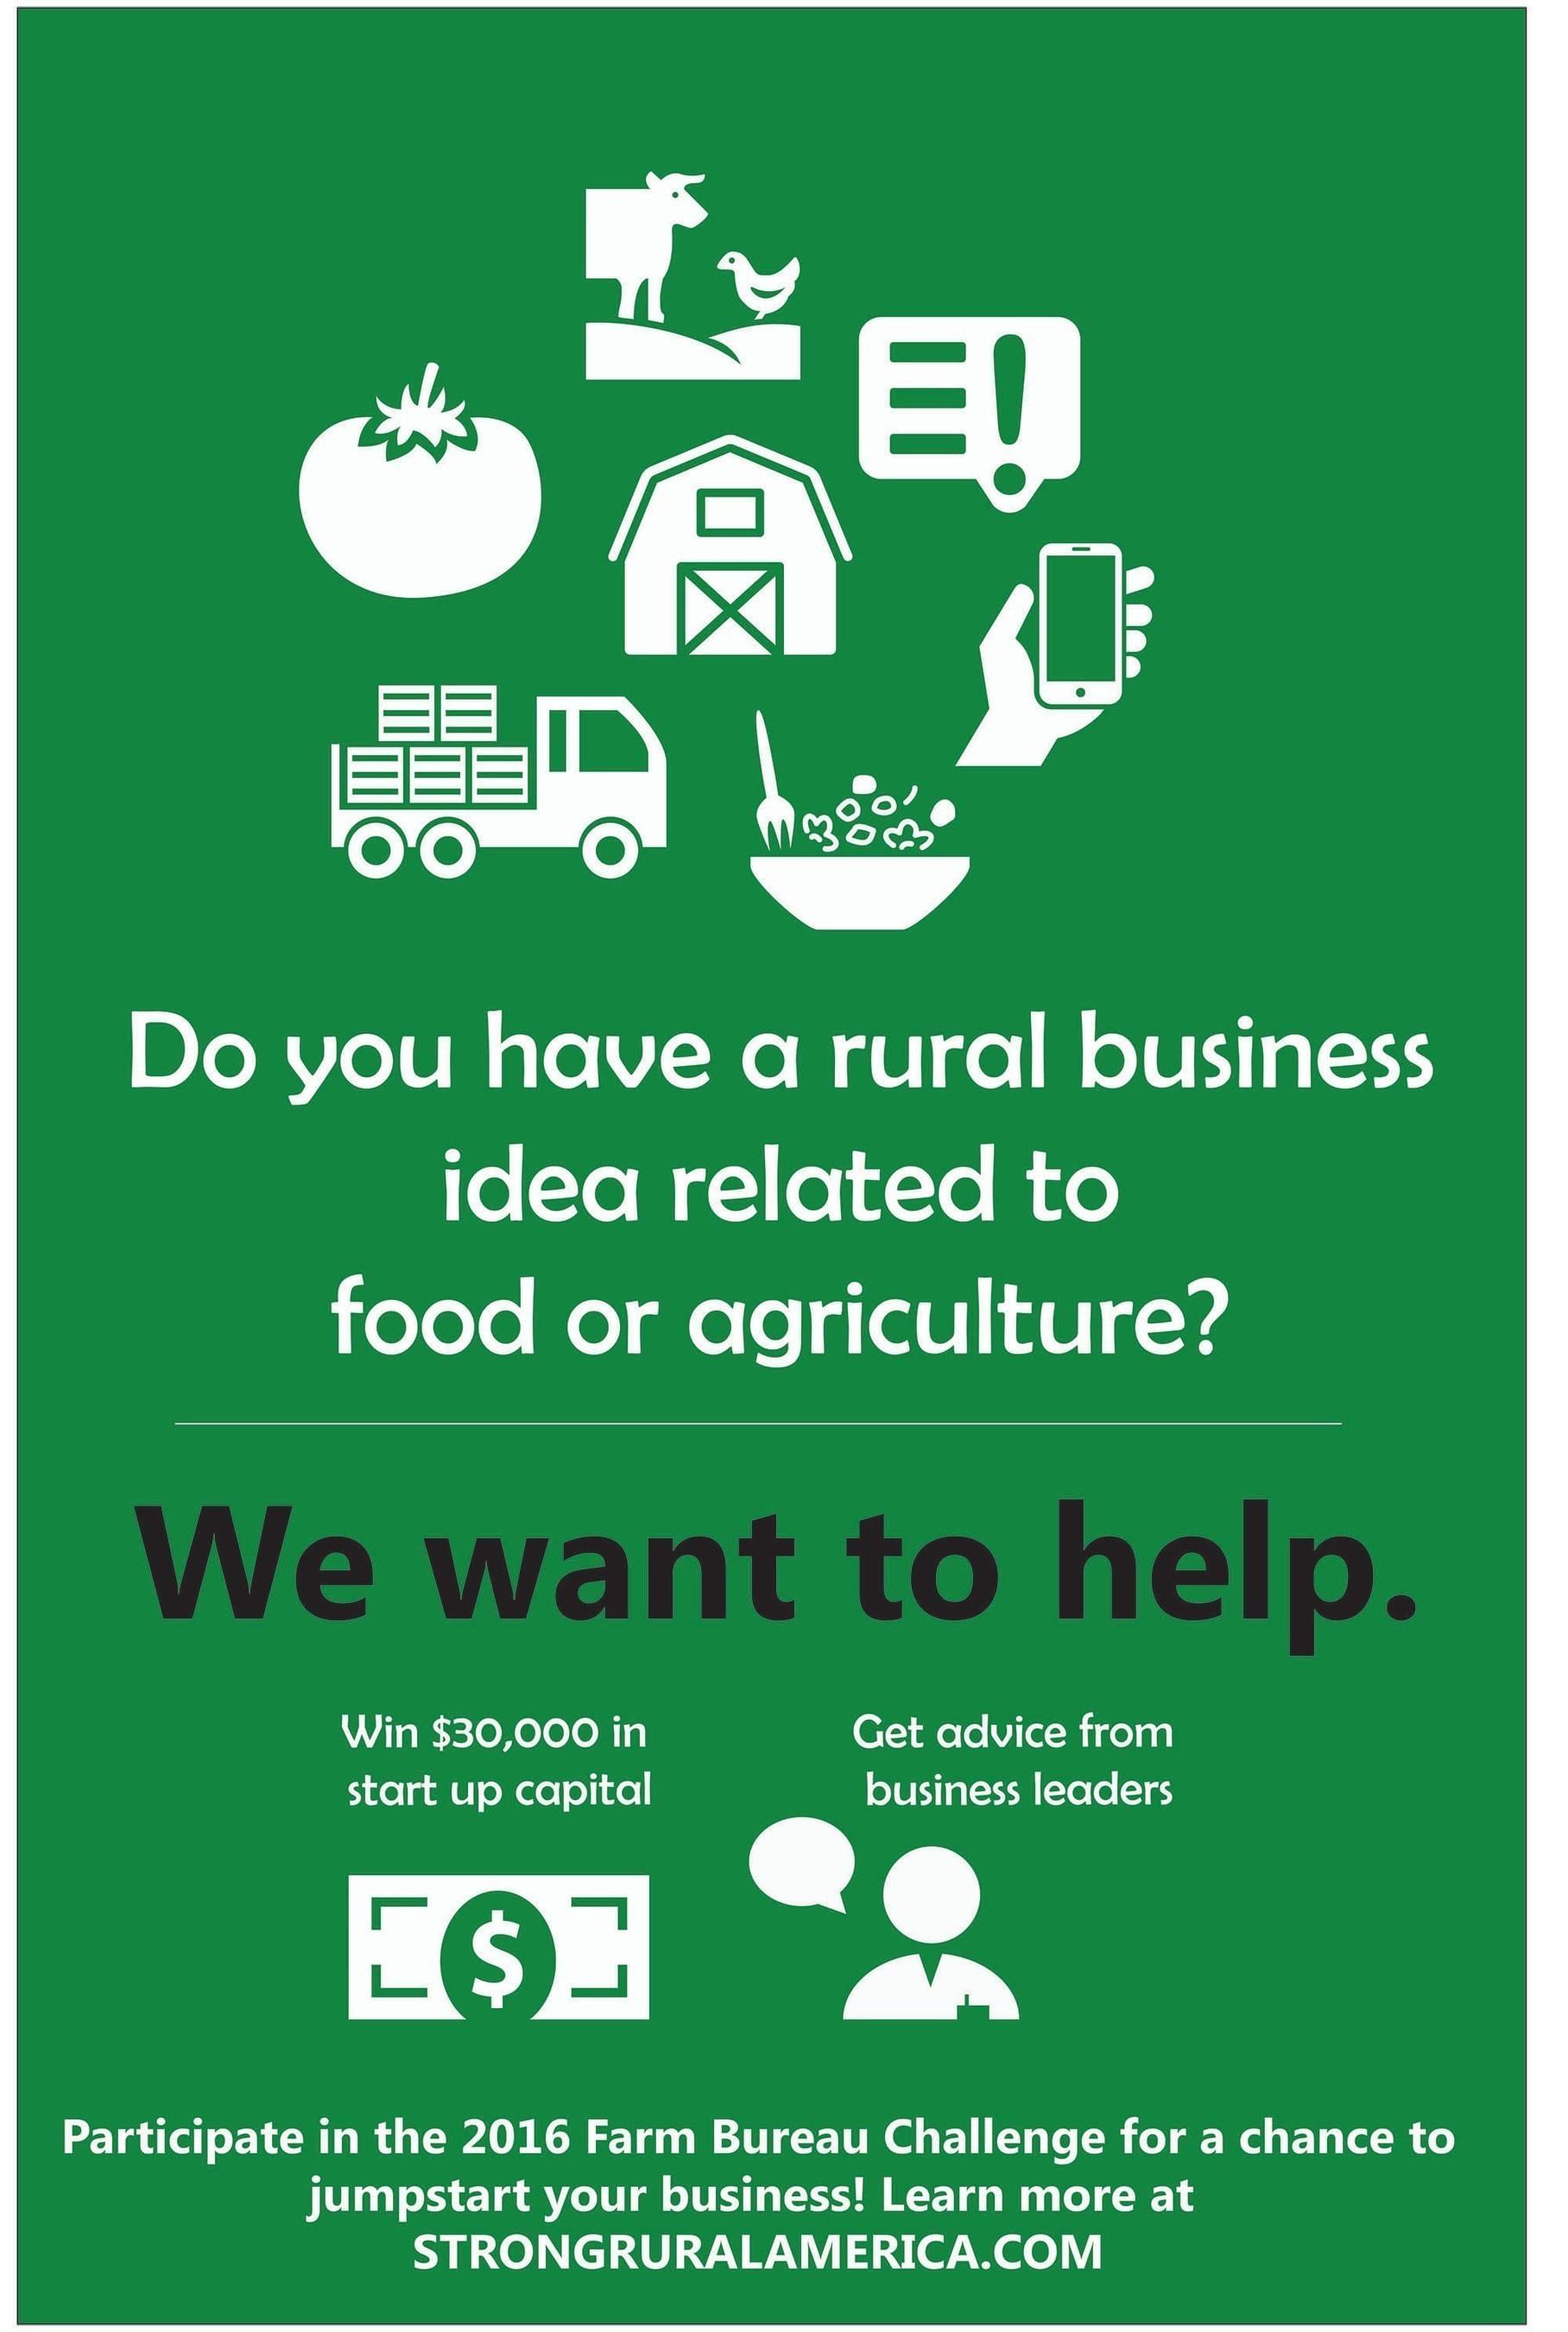 Farm Bureau Entrepreneurship Challenge